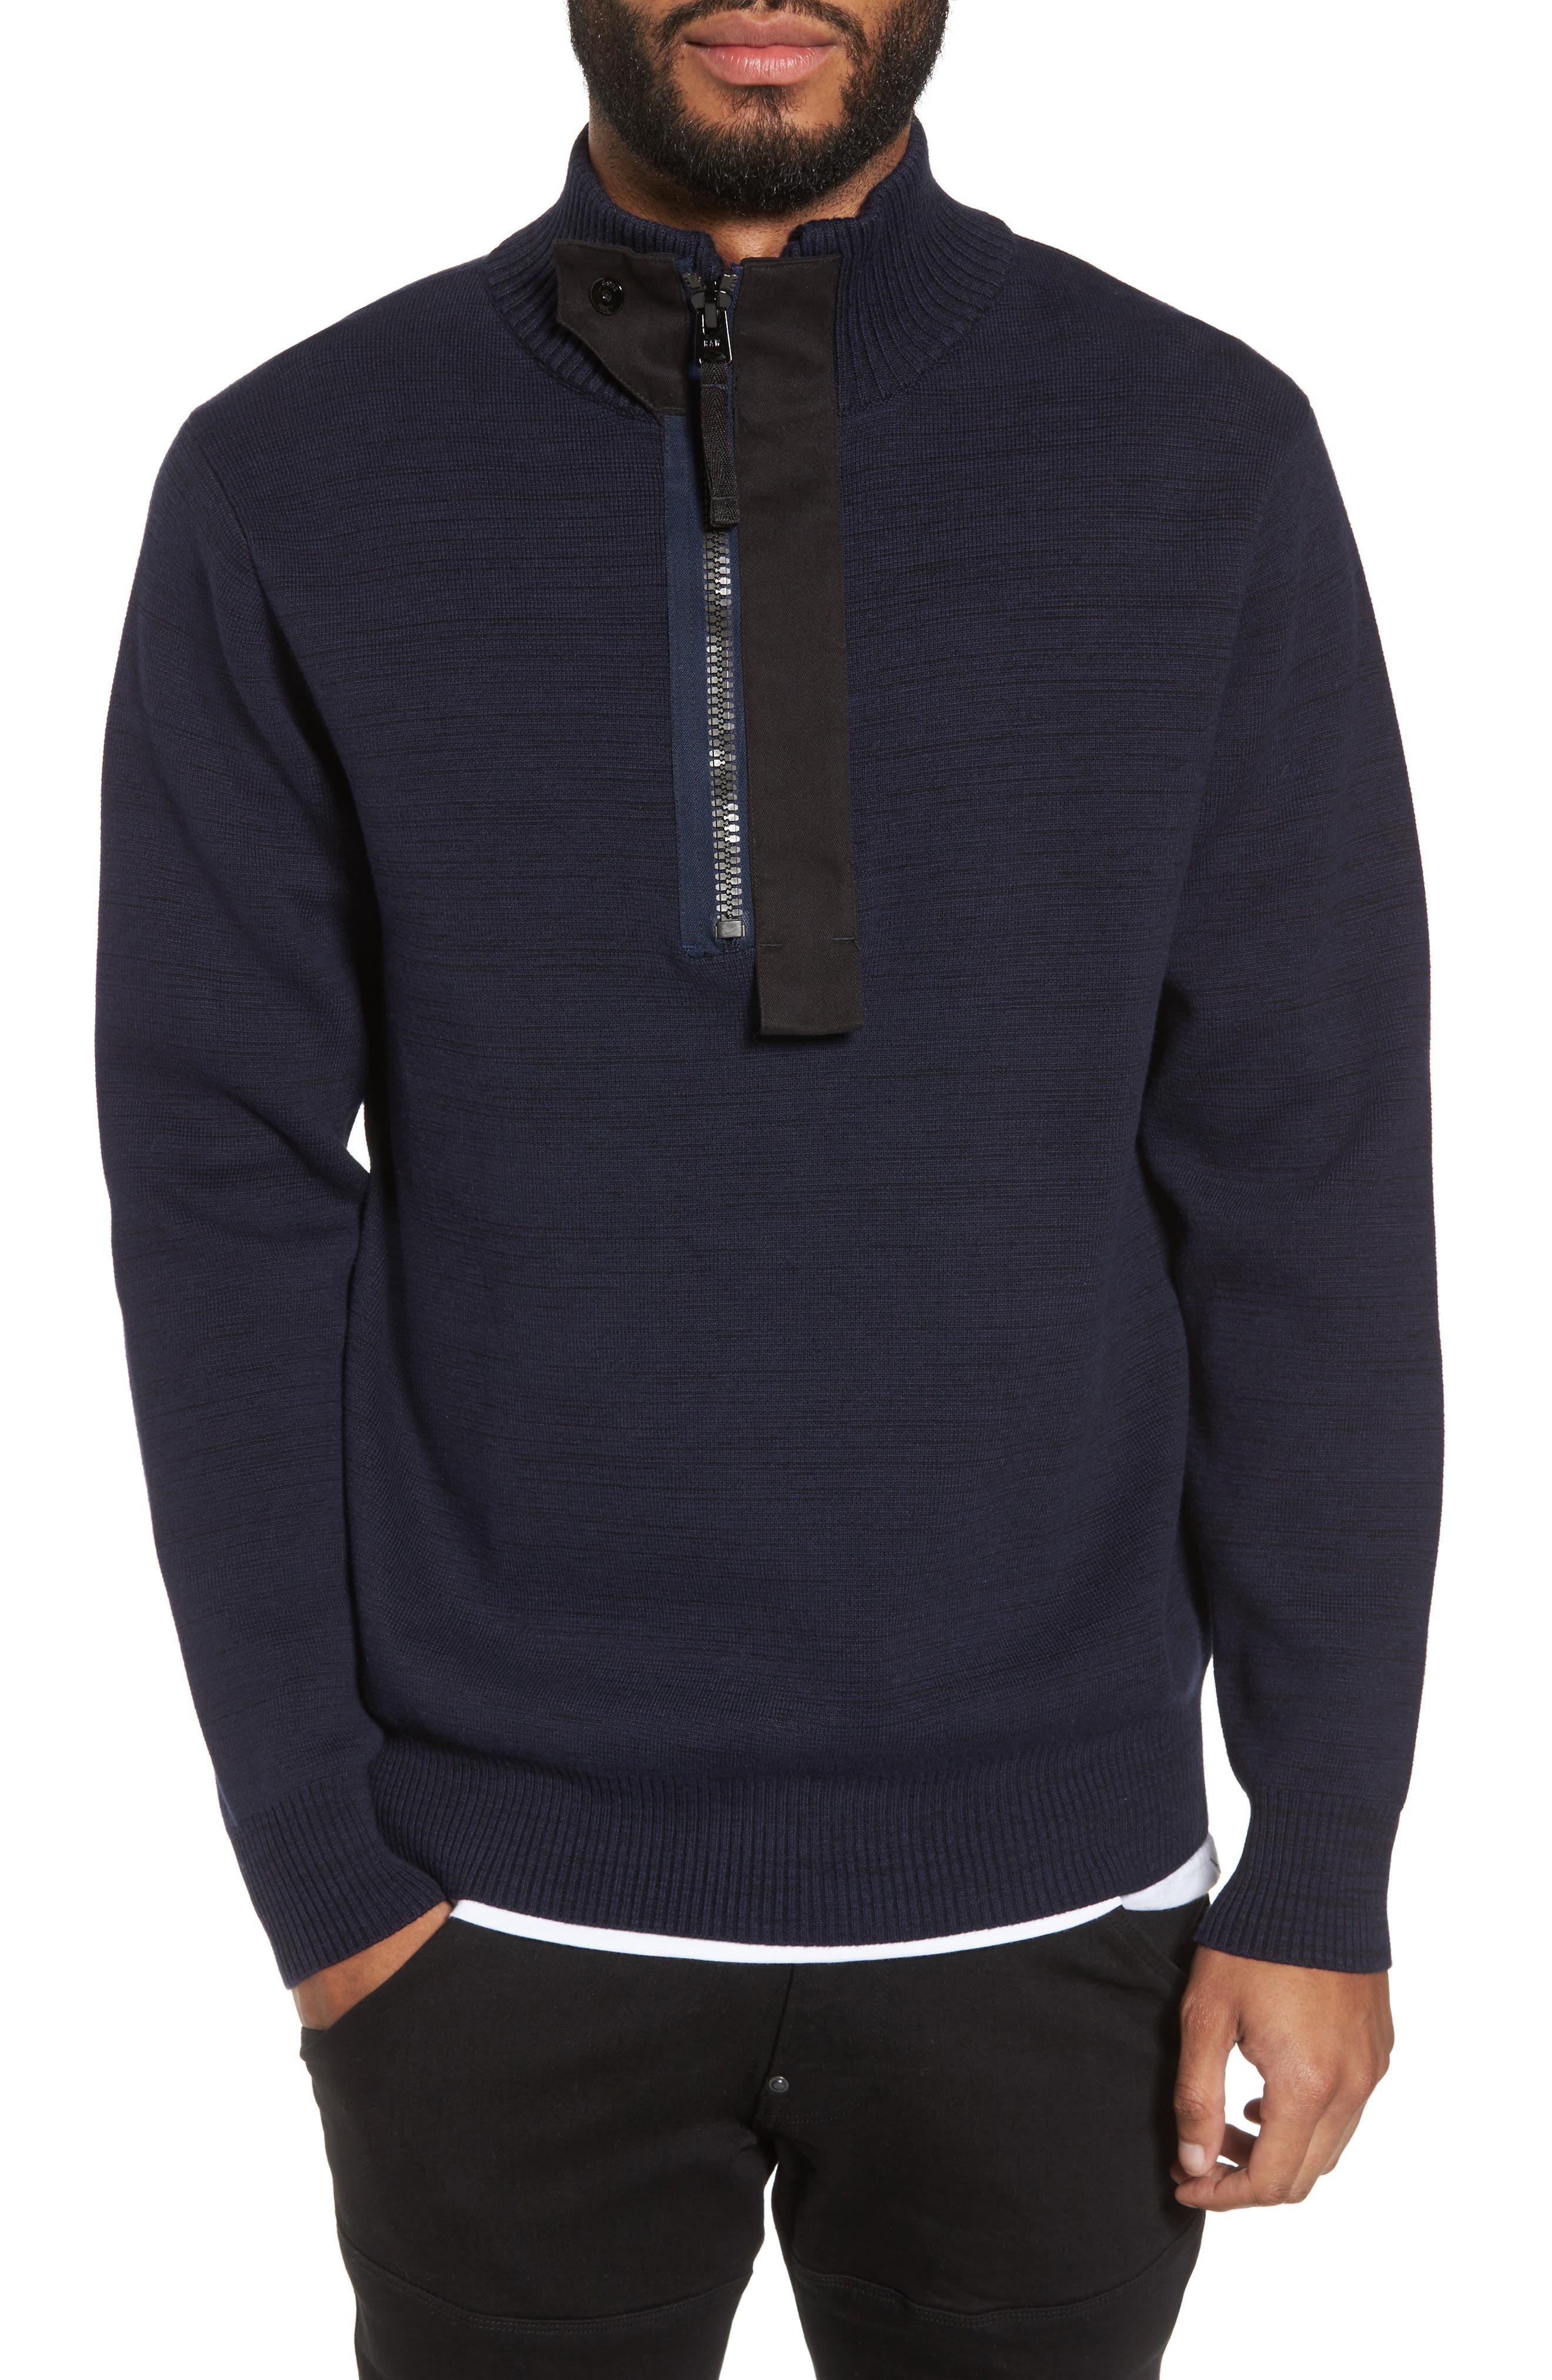 Empral Half-Zip Sweater,                         Main,                         color, Blue/ Dark Black